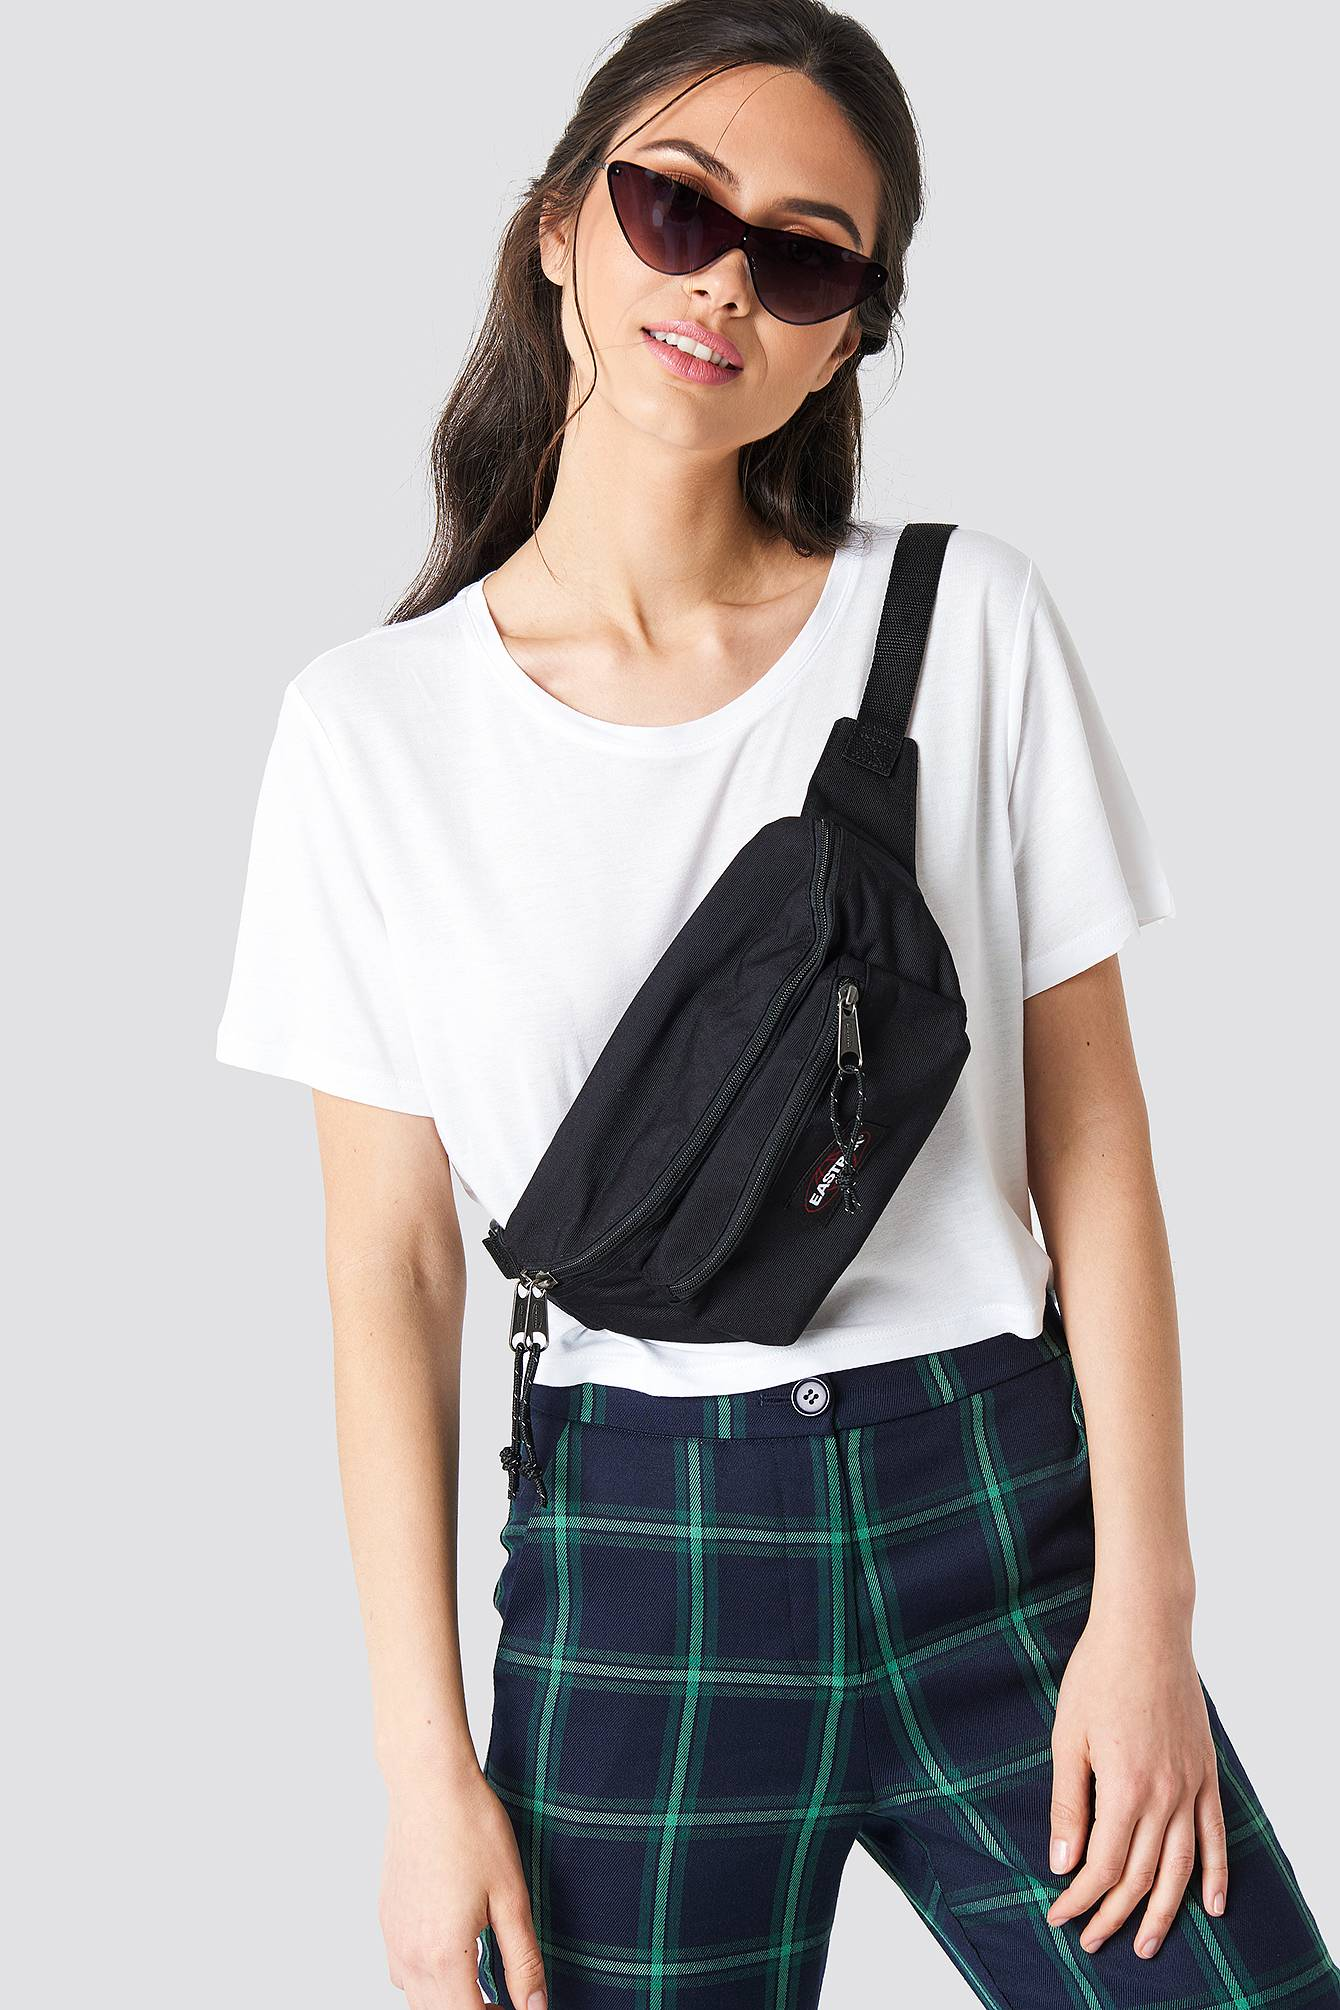 Eastpak Doggy Bag - Black  - Size: One Size